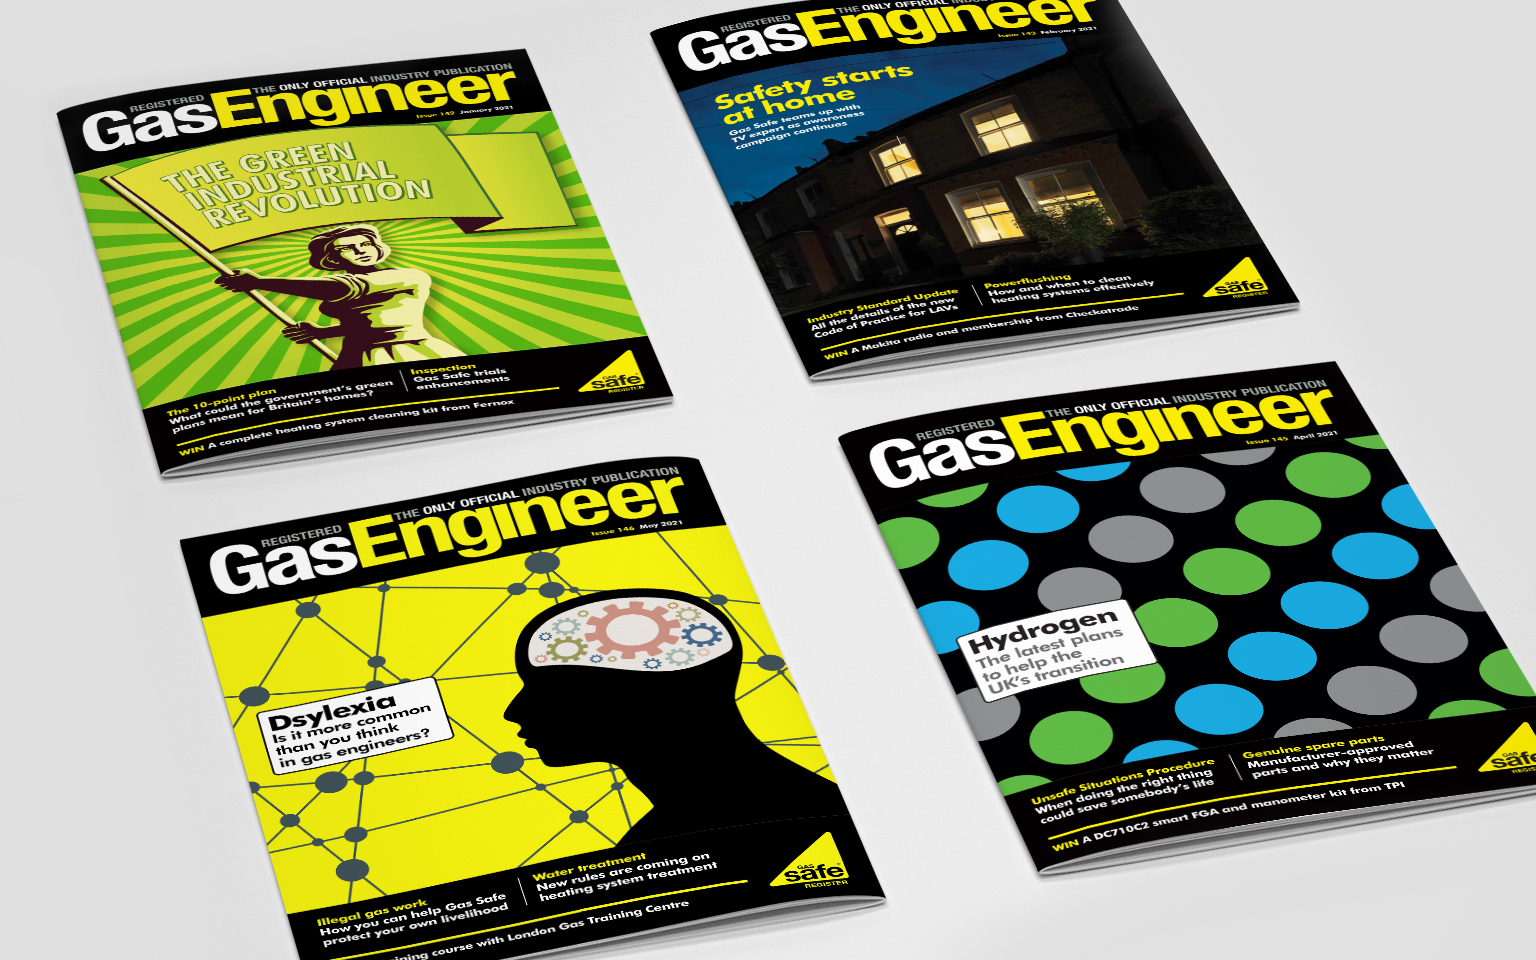 Registered Gas Engineer Magazine